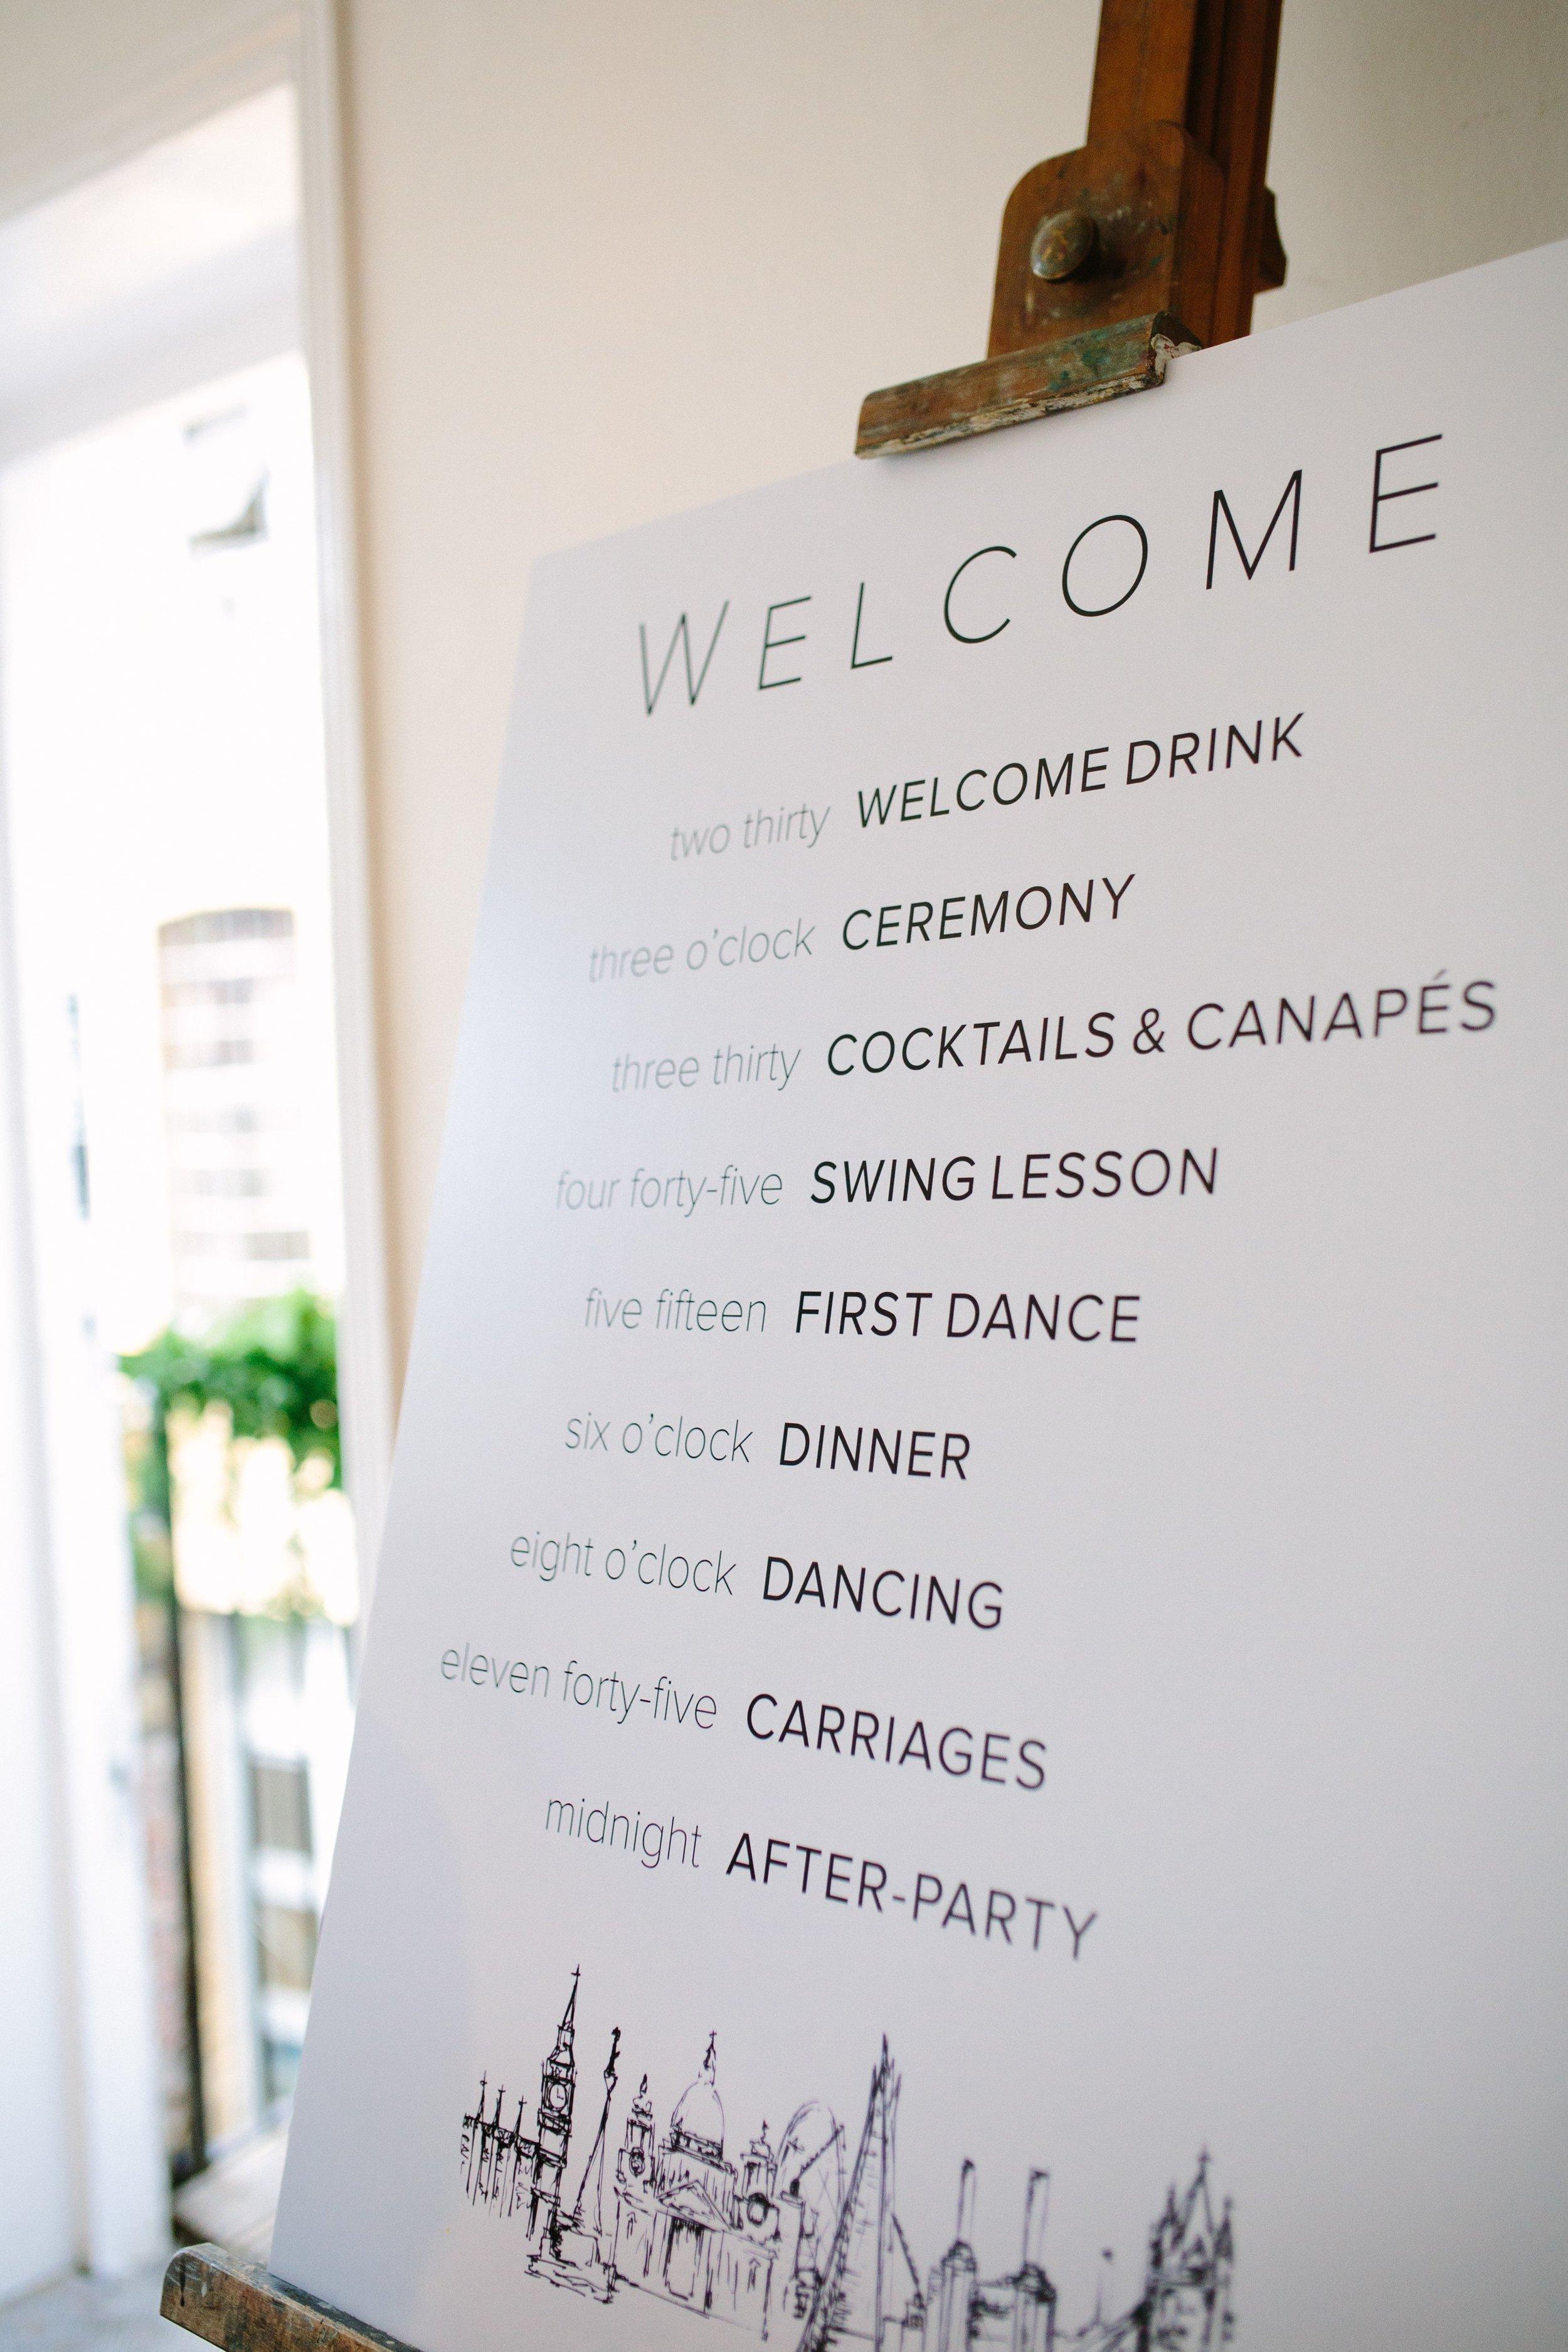 Warehouse Wedding Venue, Non-traditional wedding planner, London Wedding coordination, Event Bar, Bespoke weddings, Shoreditch Wedding, informal, Stylish, Event Planning, Unconventional